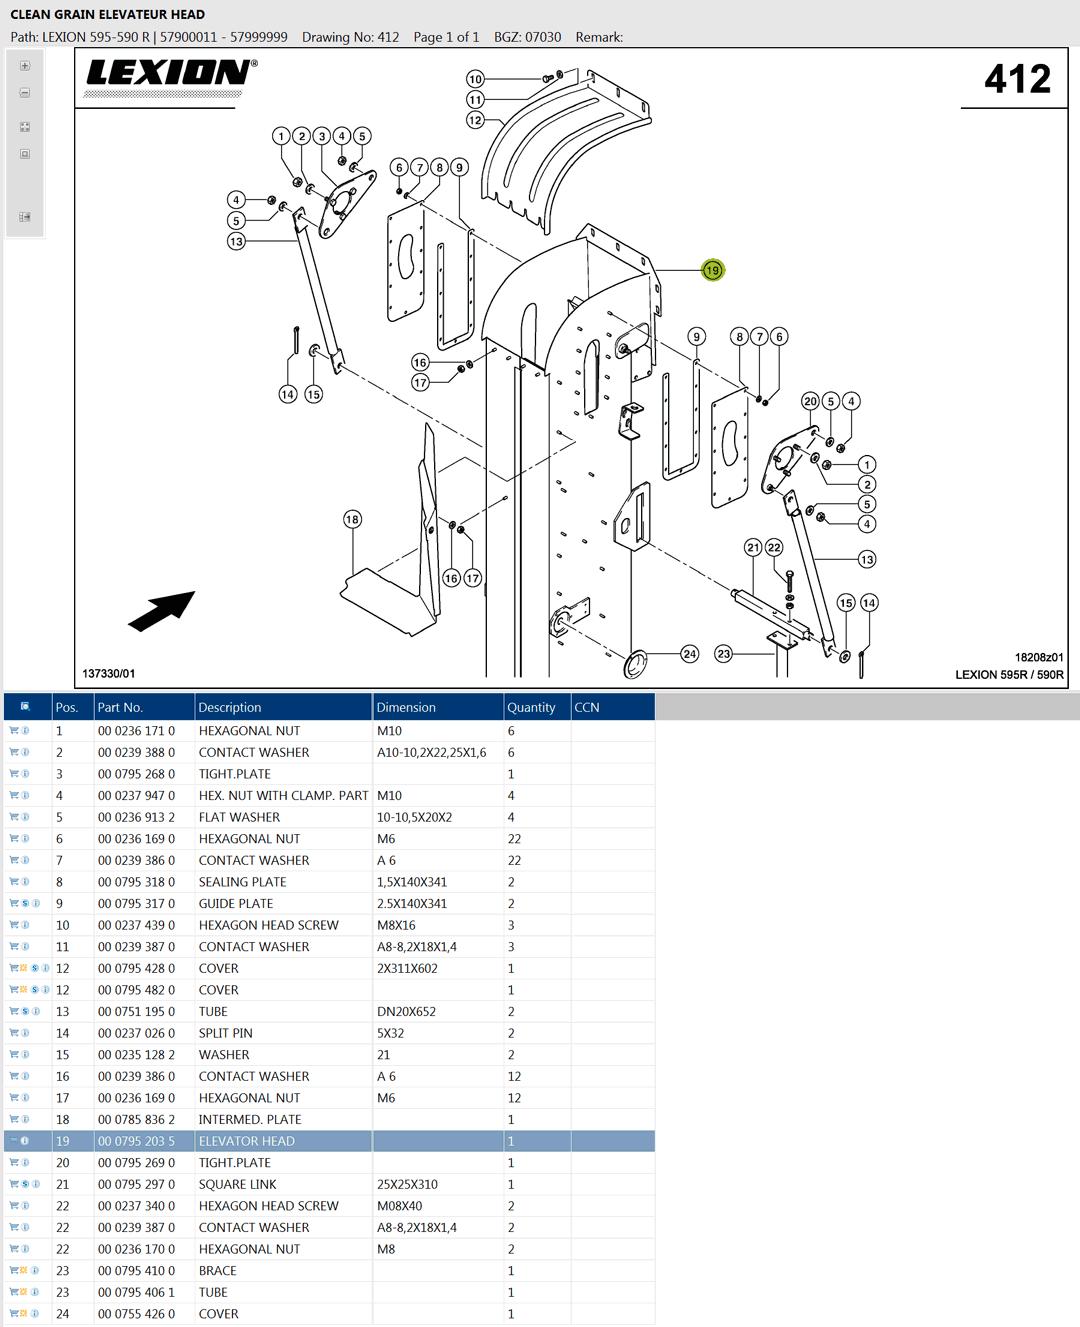 Lexion 595R parts and schemes - clean grain elevator head